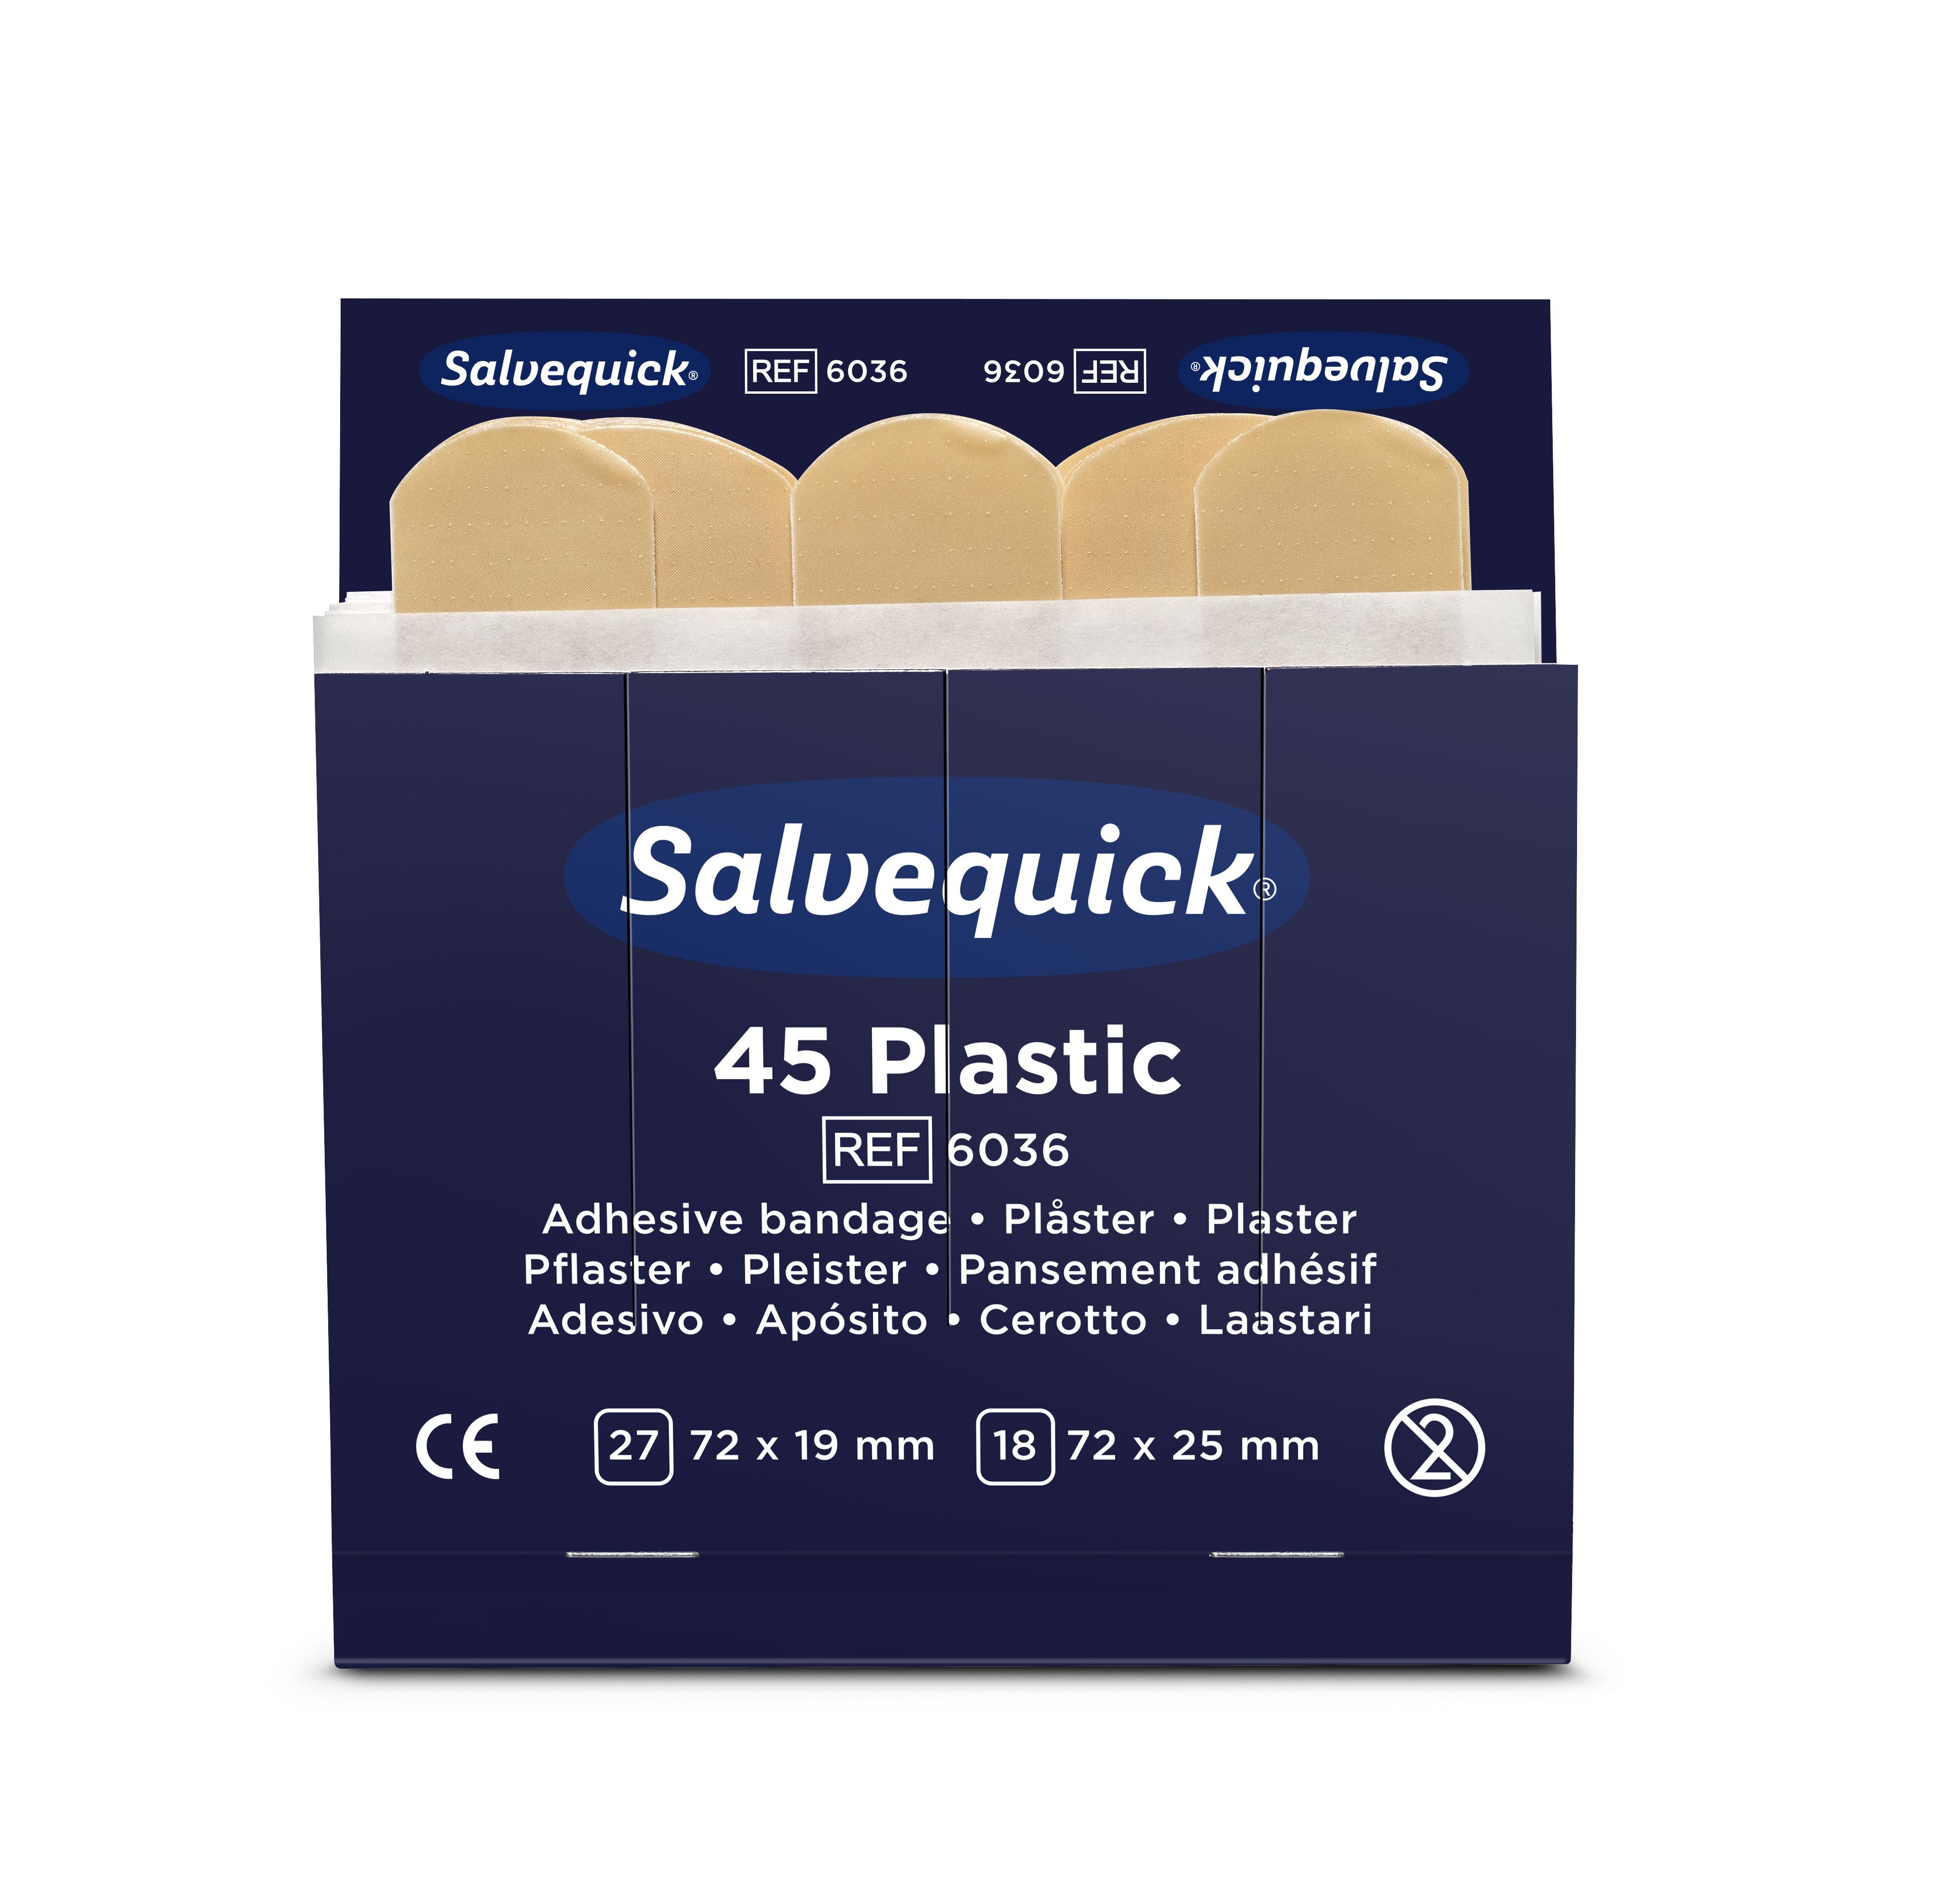 6036-Salvequick-Plastic-Plaster-Front